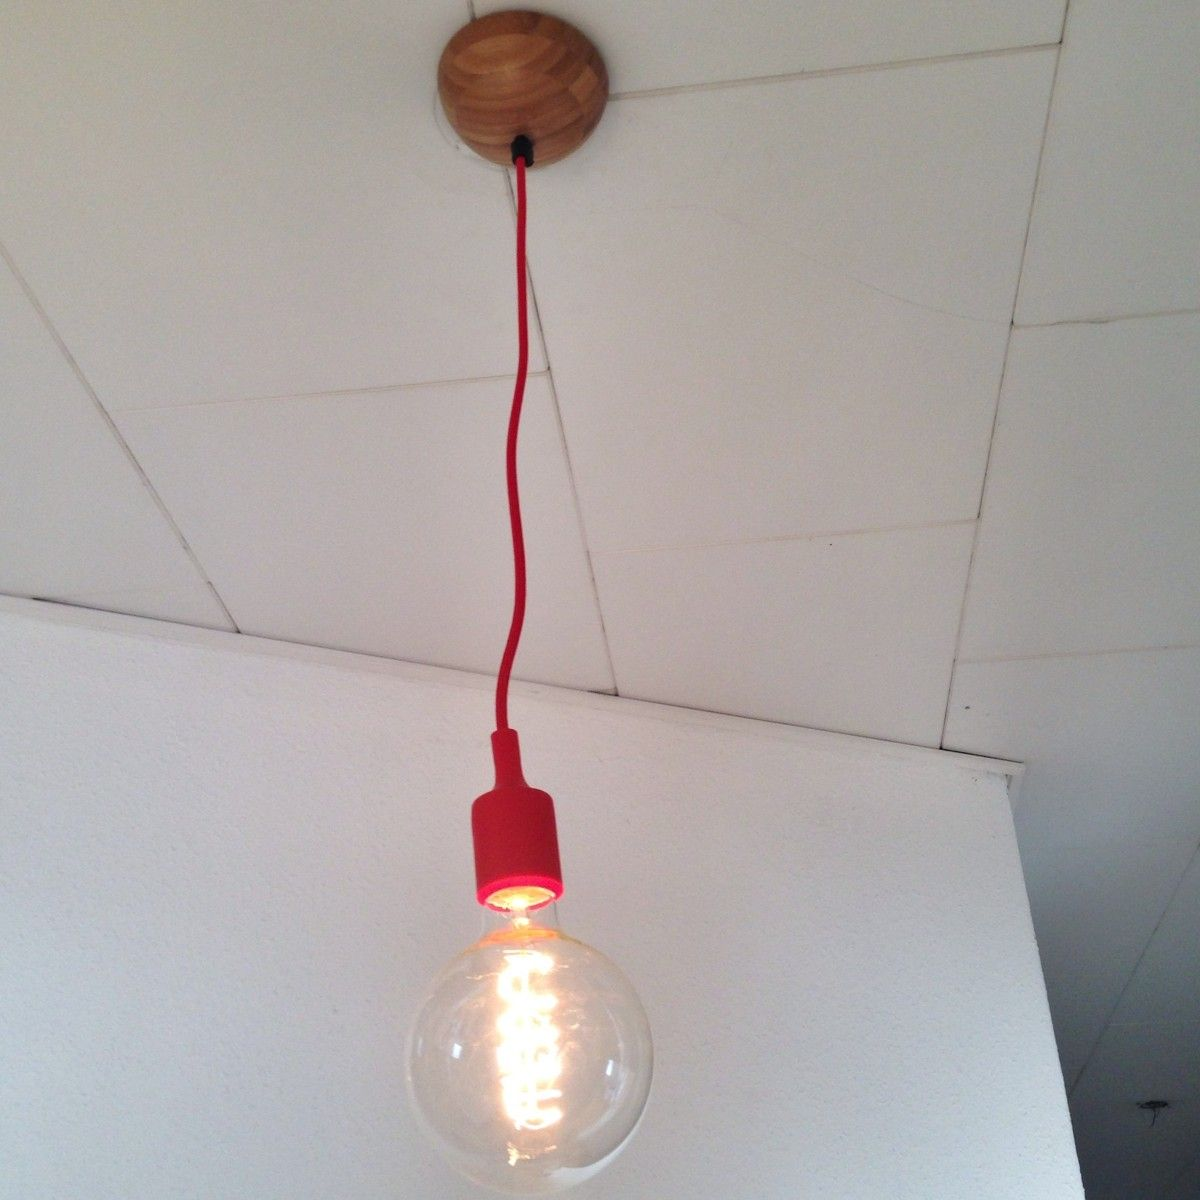 Blanda Matt serving bowl to ceiling light canopy hack IKEA Hackers